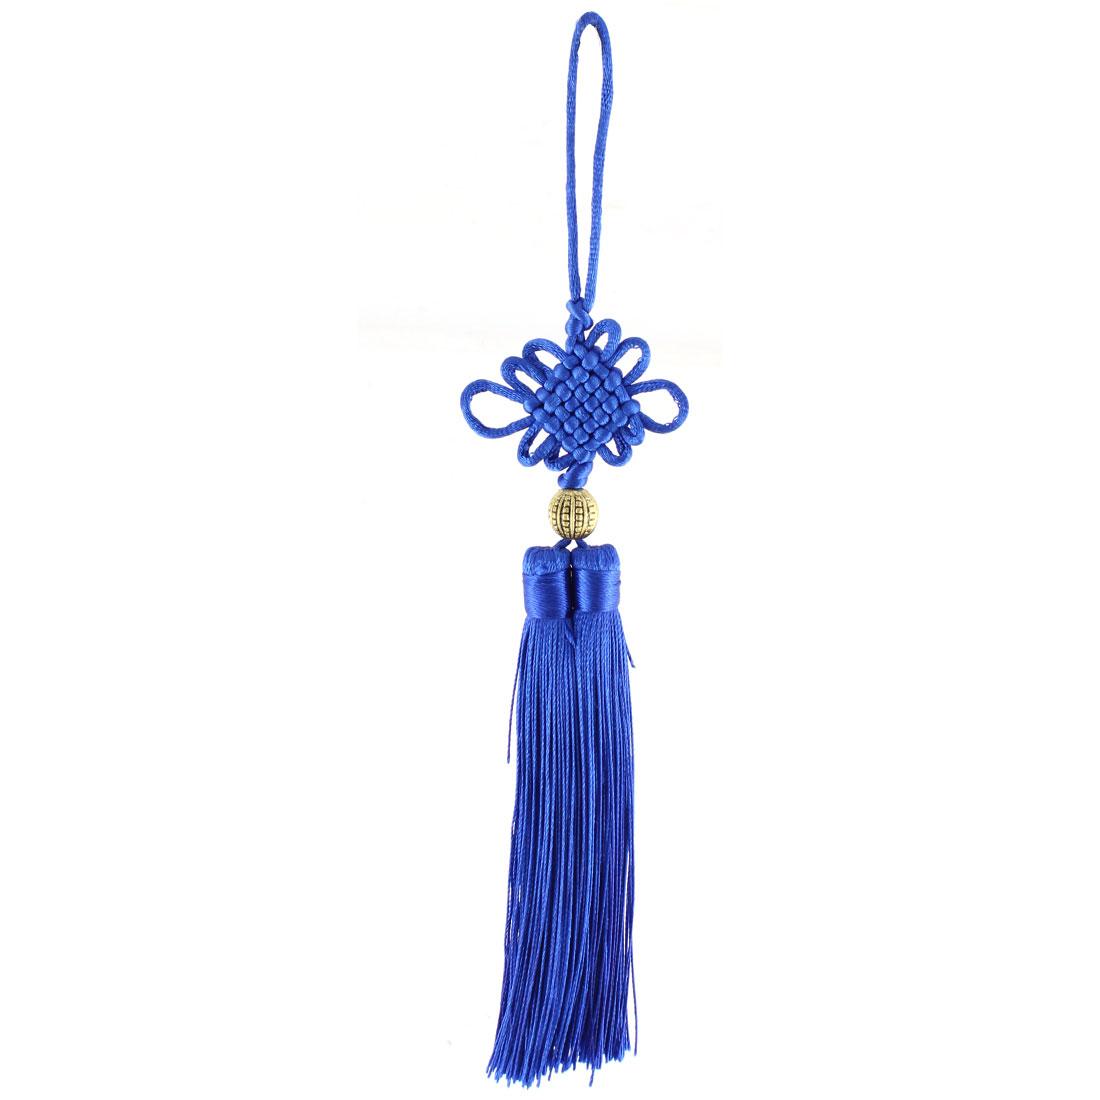 Nylon Handmade Double Tassel Chinese Knot Hanging Decor Blue